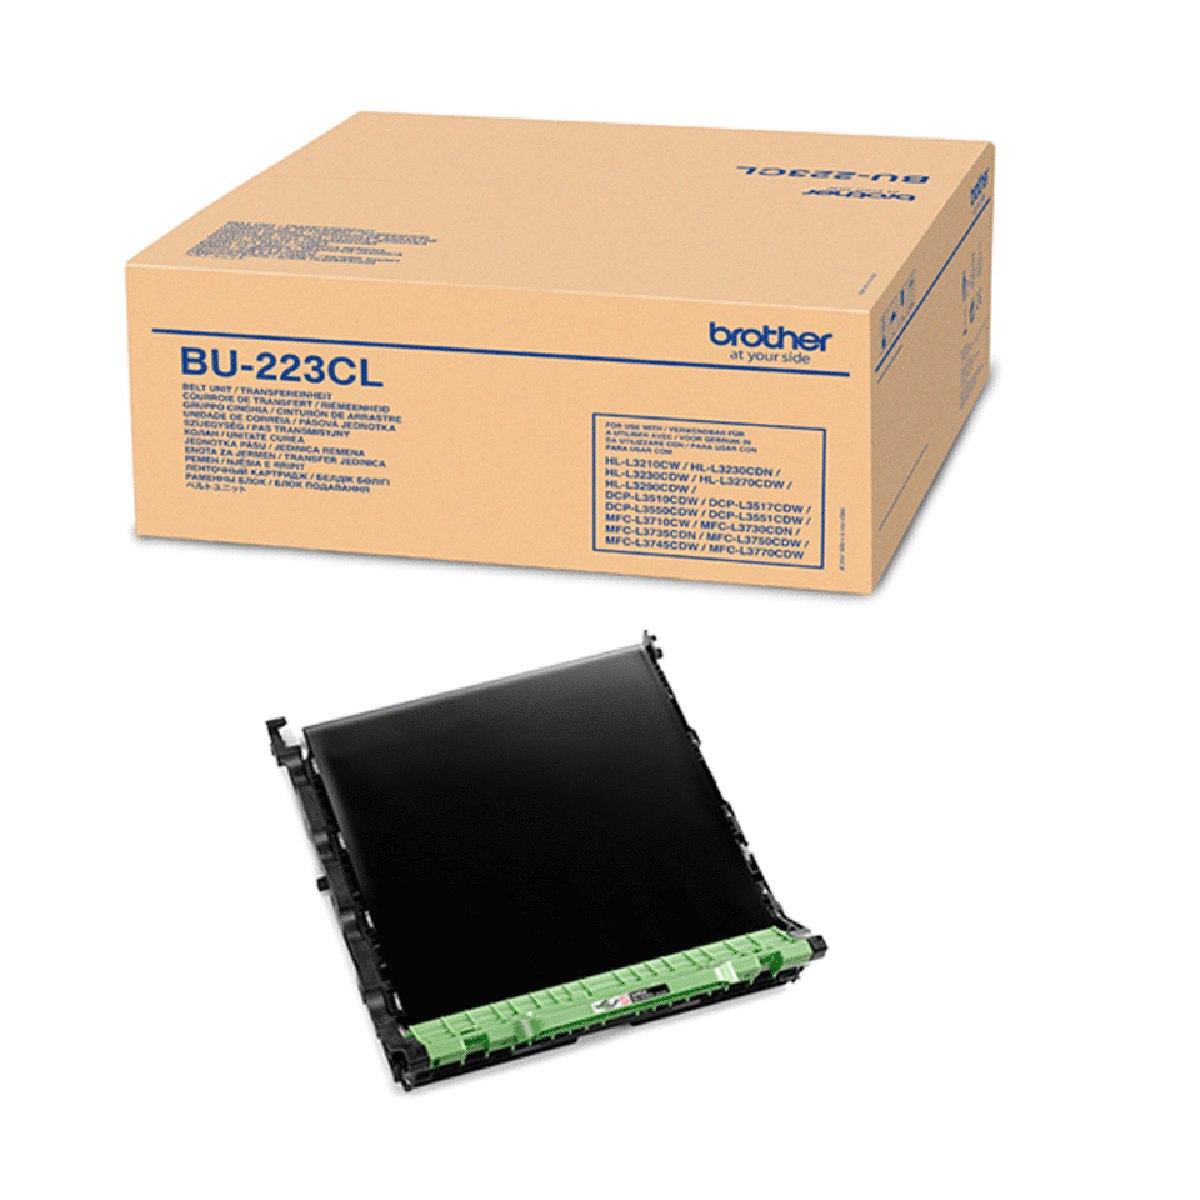 Brother Belt Unit To Suit HL-3230CDW/3270CDW/DCP-L3510CDW/MFC-L3745CDW/L3750CDW/L3770CDW (50,000 Pages)